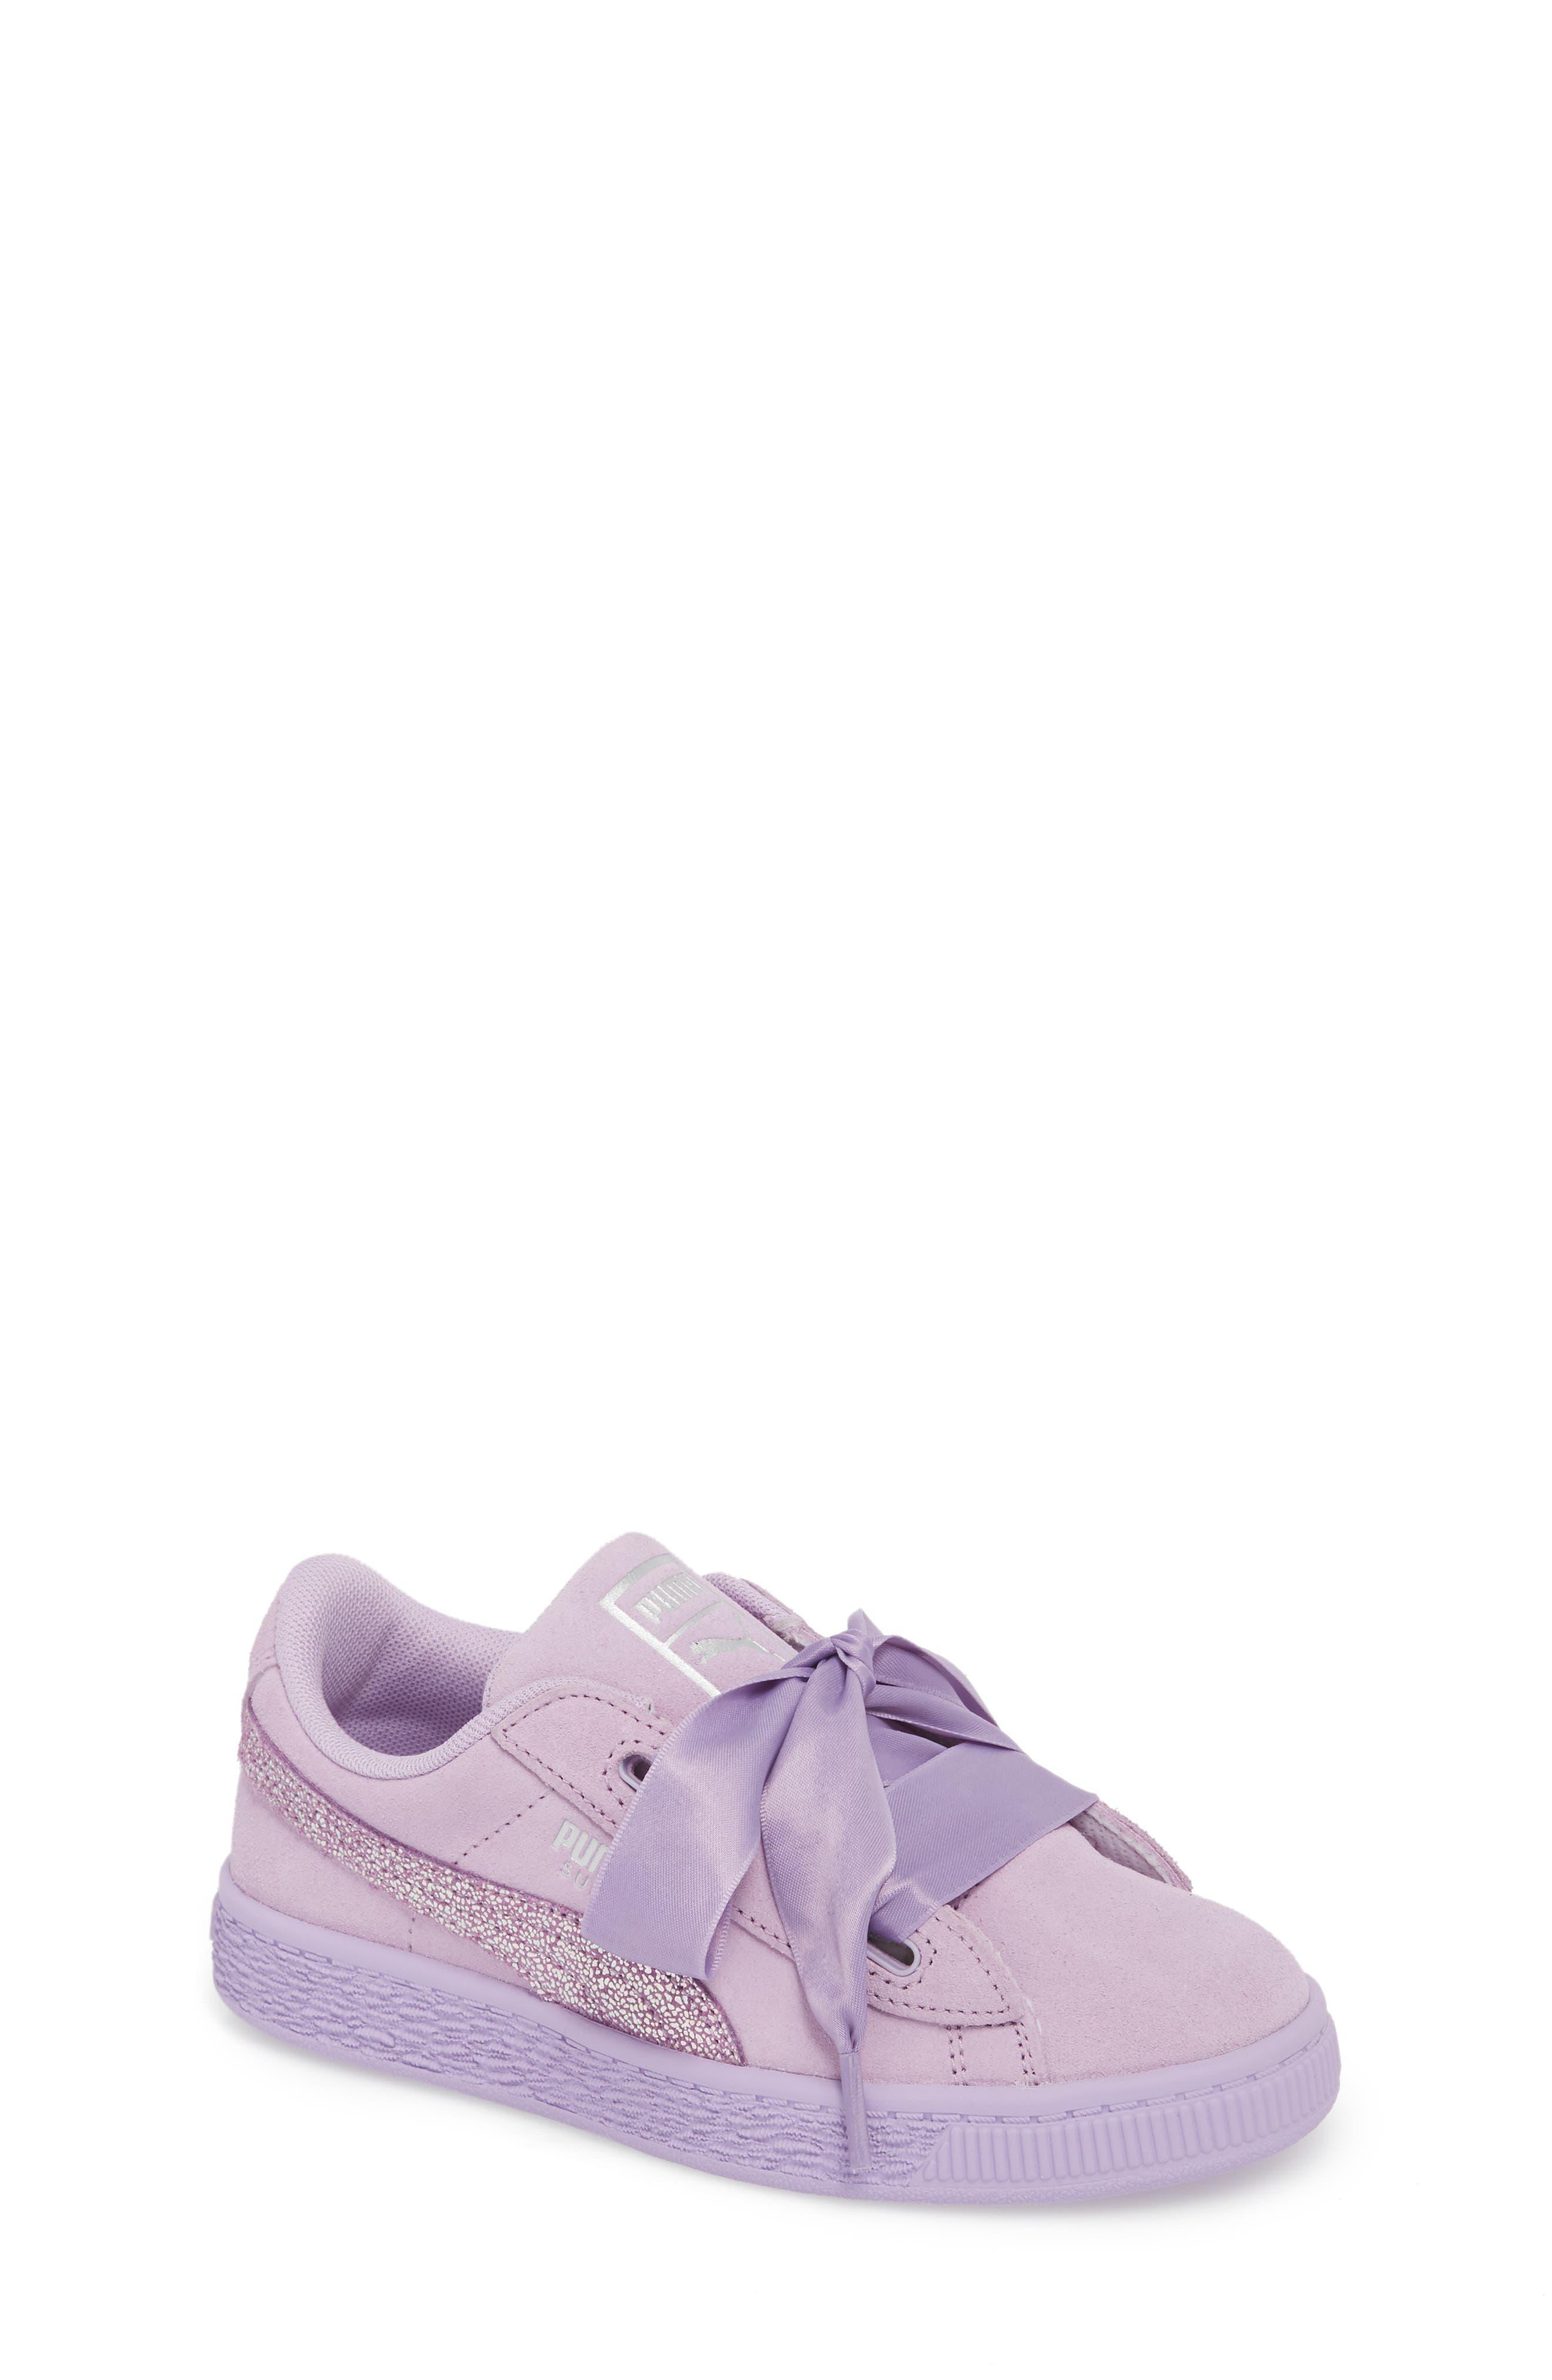 Basket Heart Glitz Sneaker,                             Main thumbnail 1, color,                             Purple Haze/ Silver